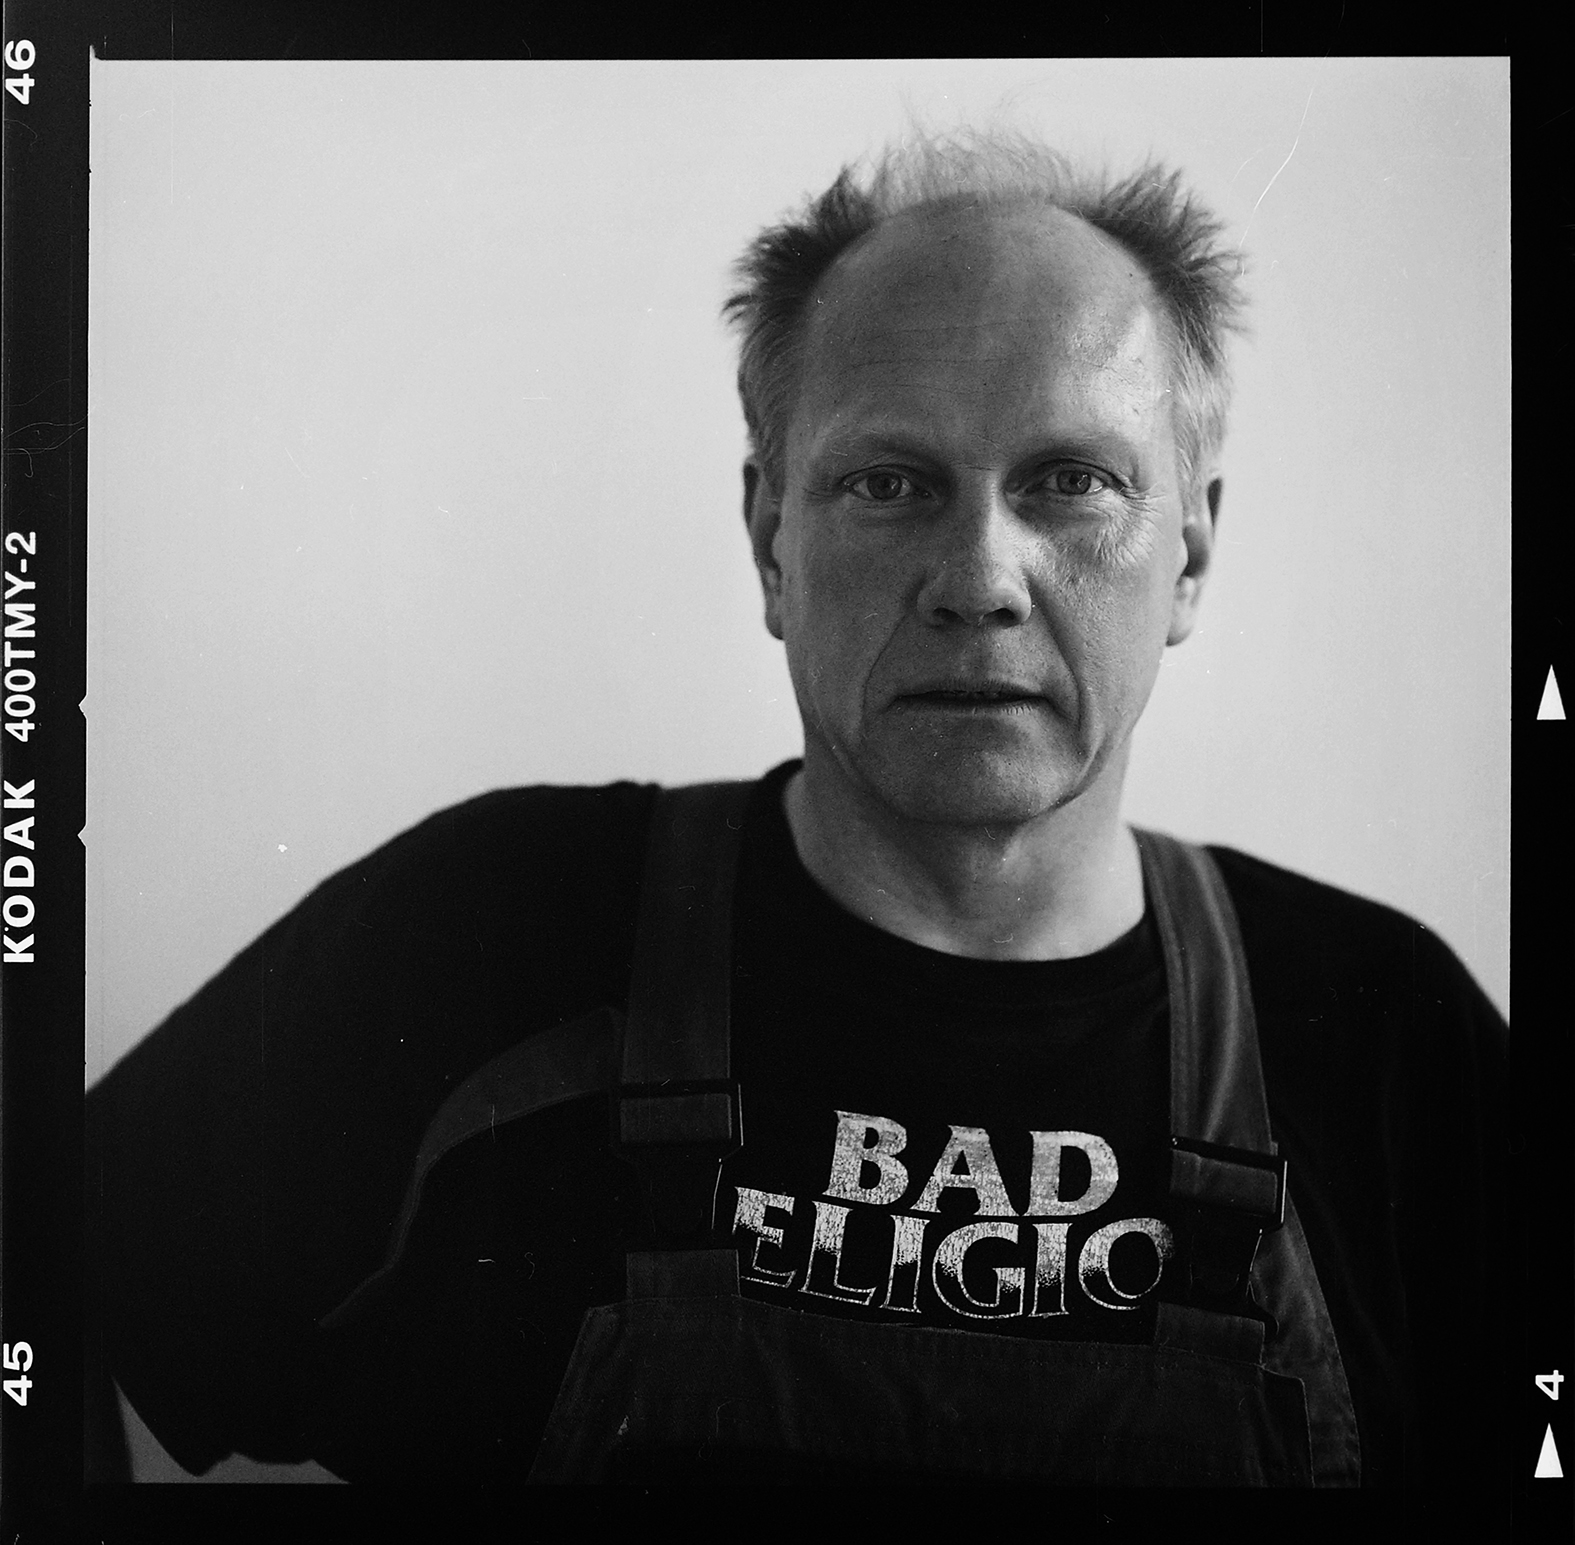 Konstnär Peter Johansson. Foto: Mikael Andersson, 2016-005-19, Hasselblad 500cm, 150 mm, f5,6-1/500